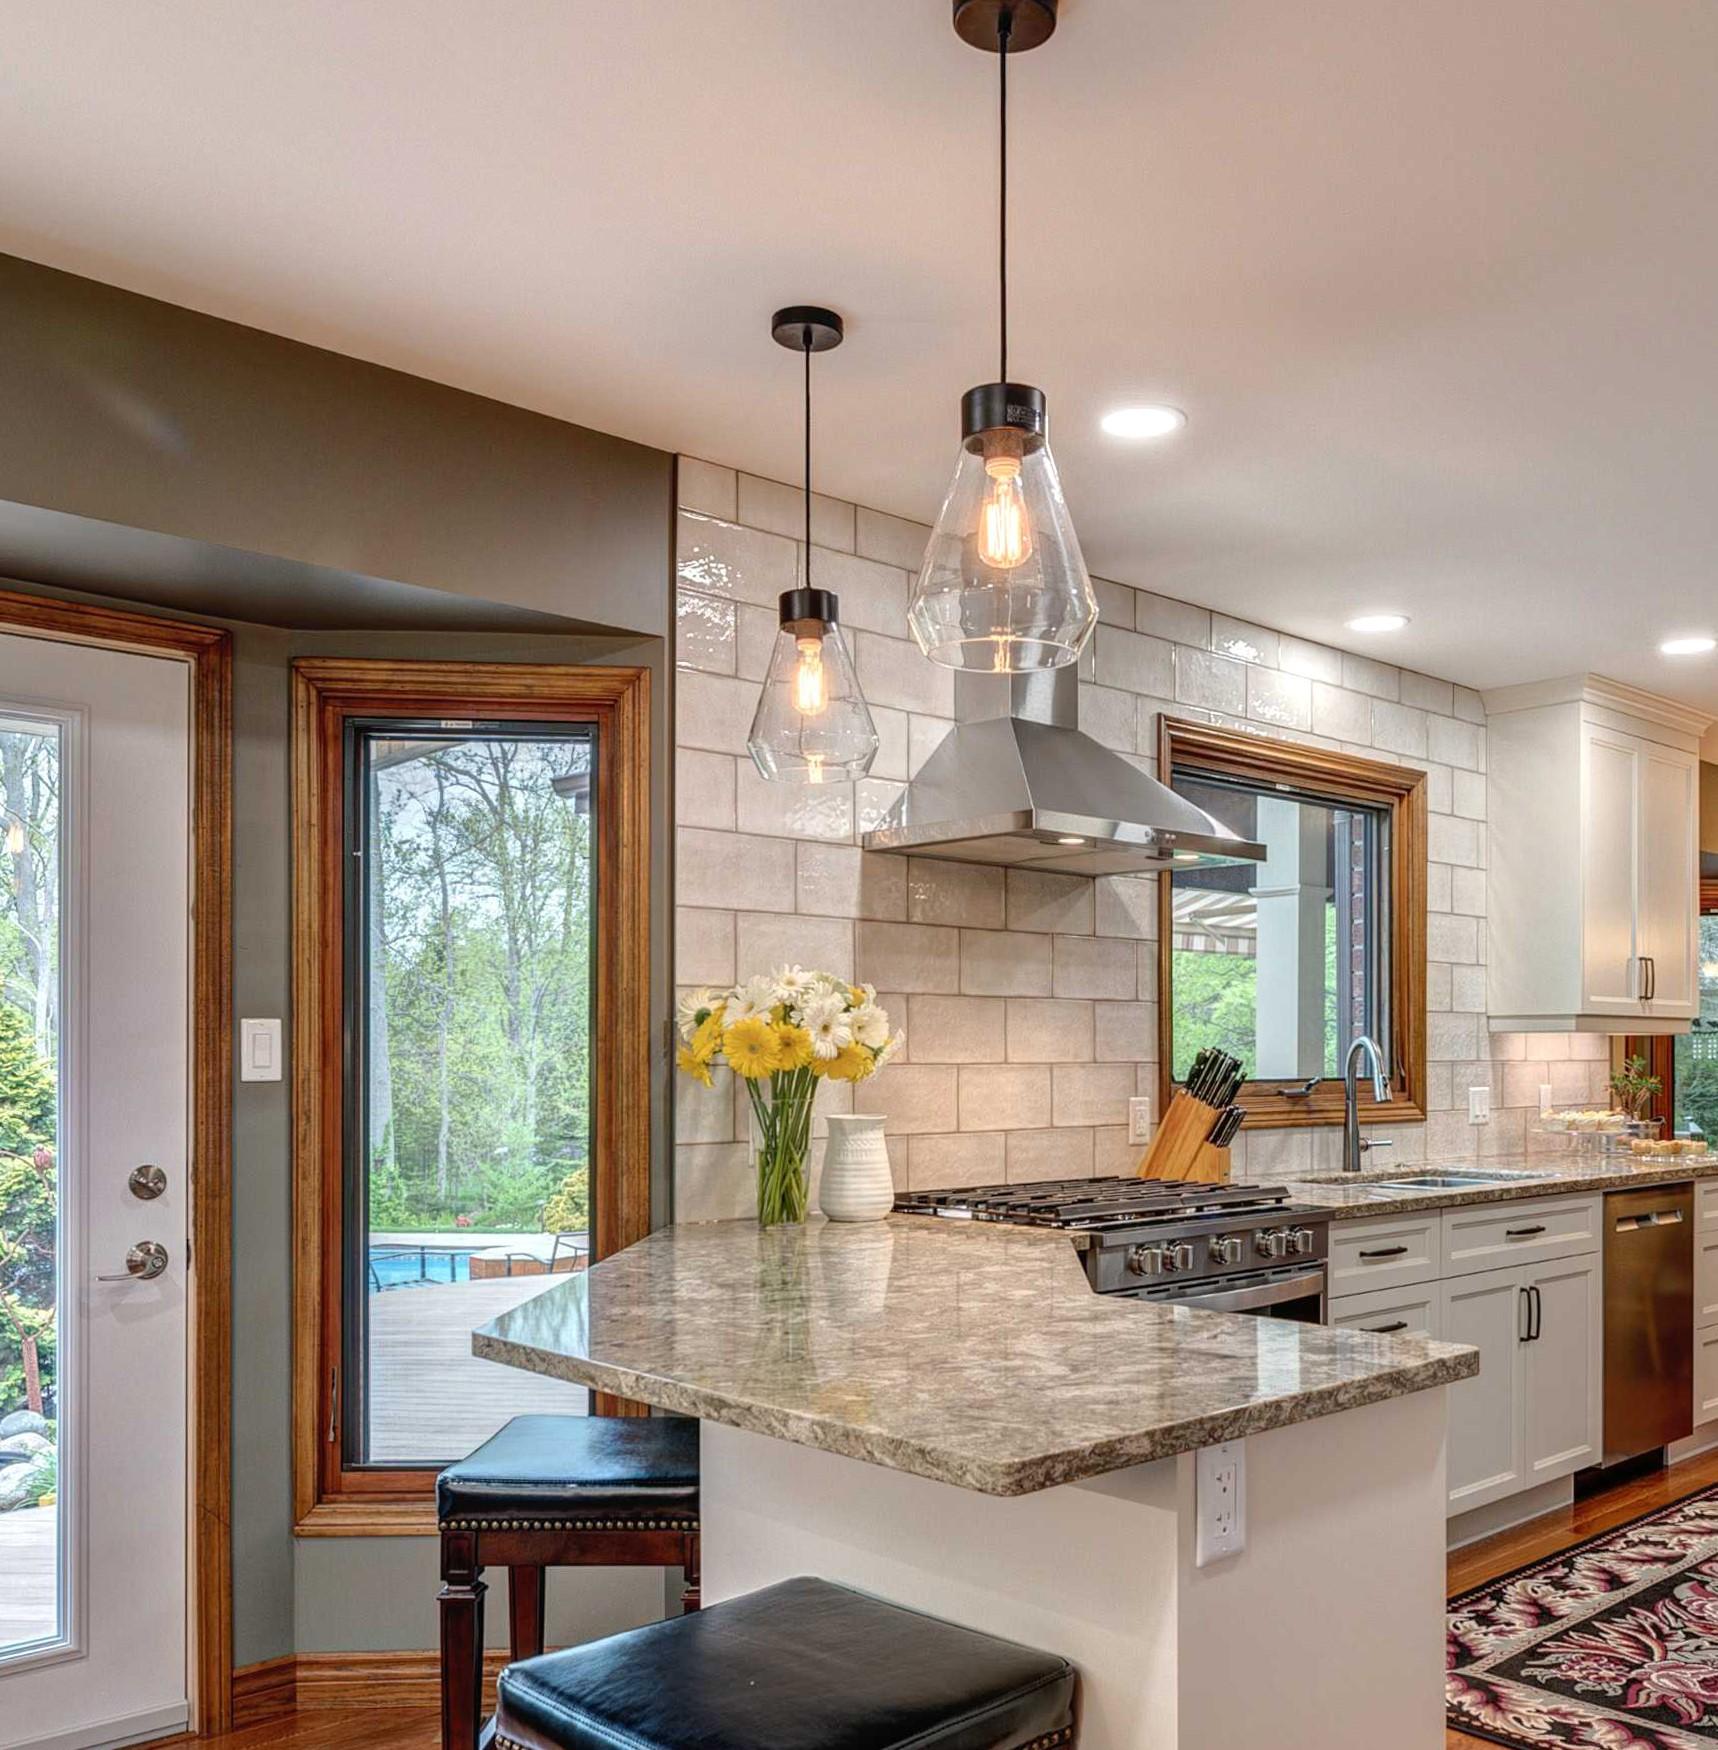 lighting a kitchen island or peninsula